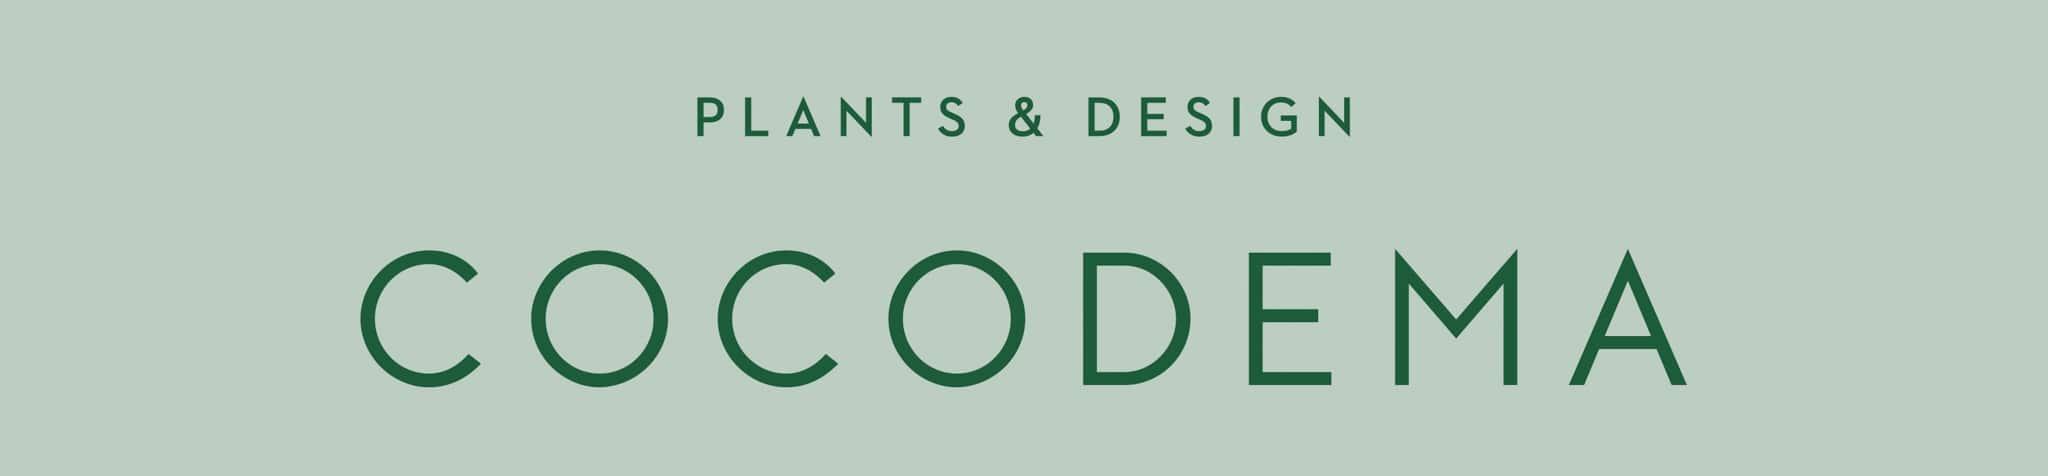 C O C O D E M A | Yaşayan Bitki Tasarımları